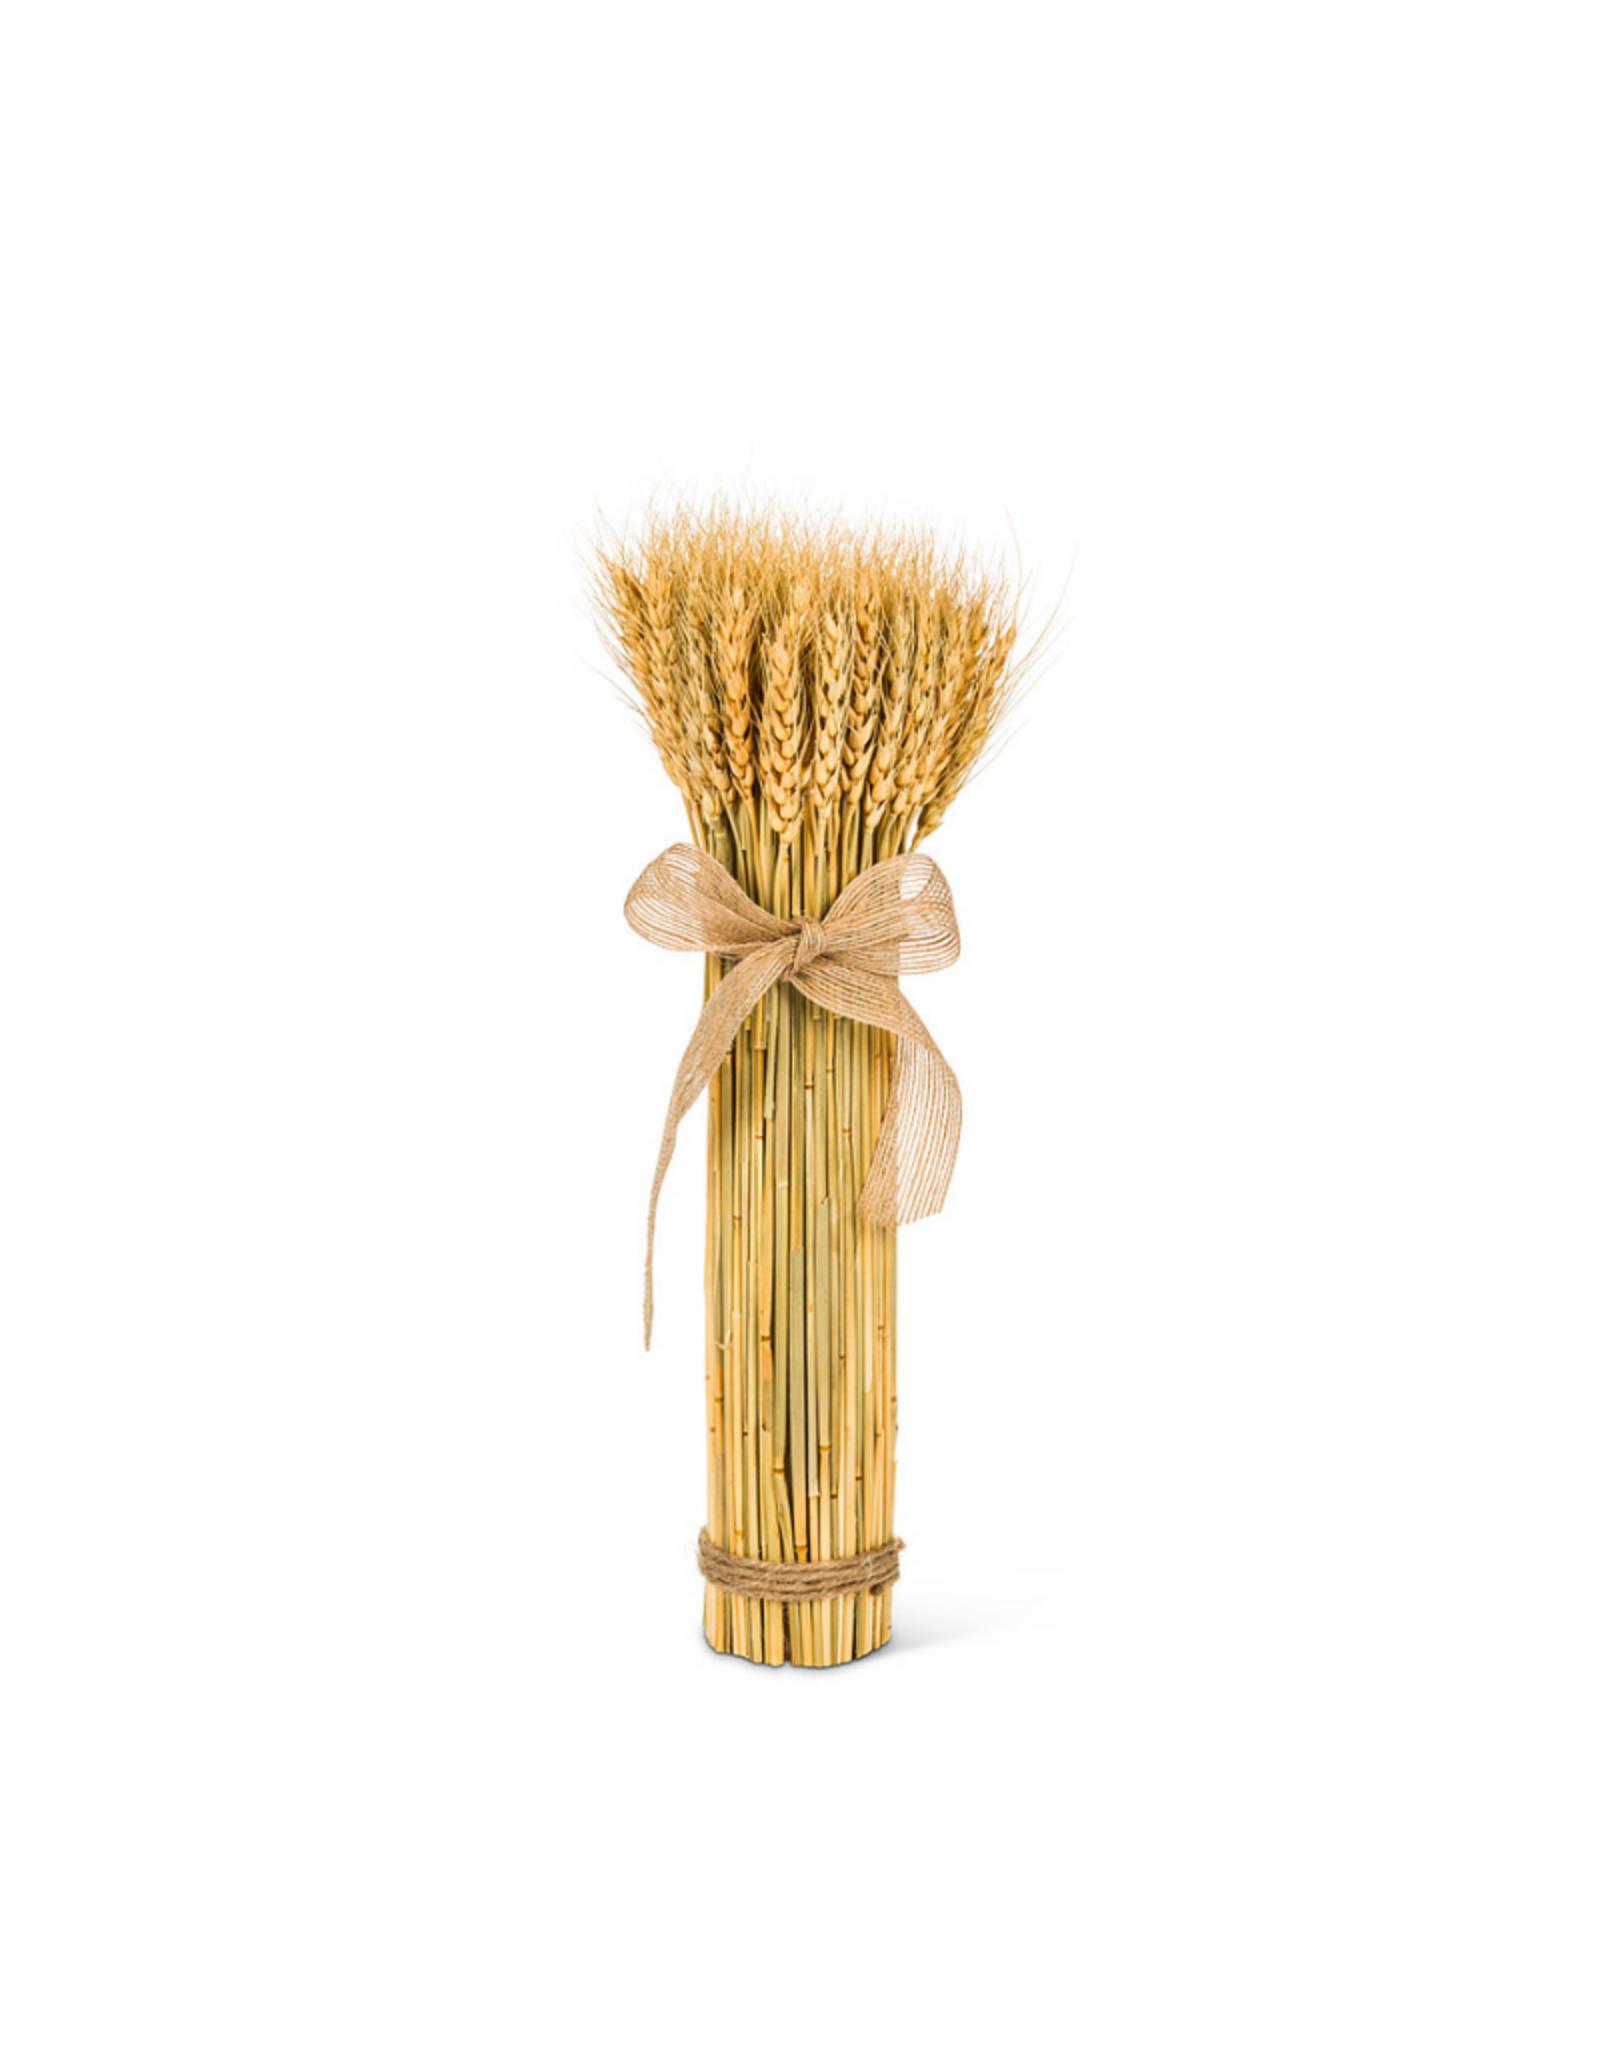 Abbott Gerbe de blé 15'' hauteur